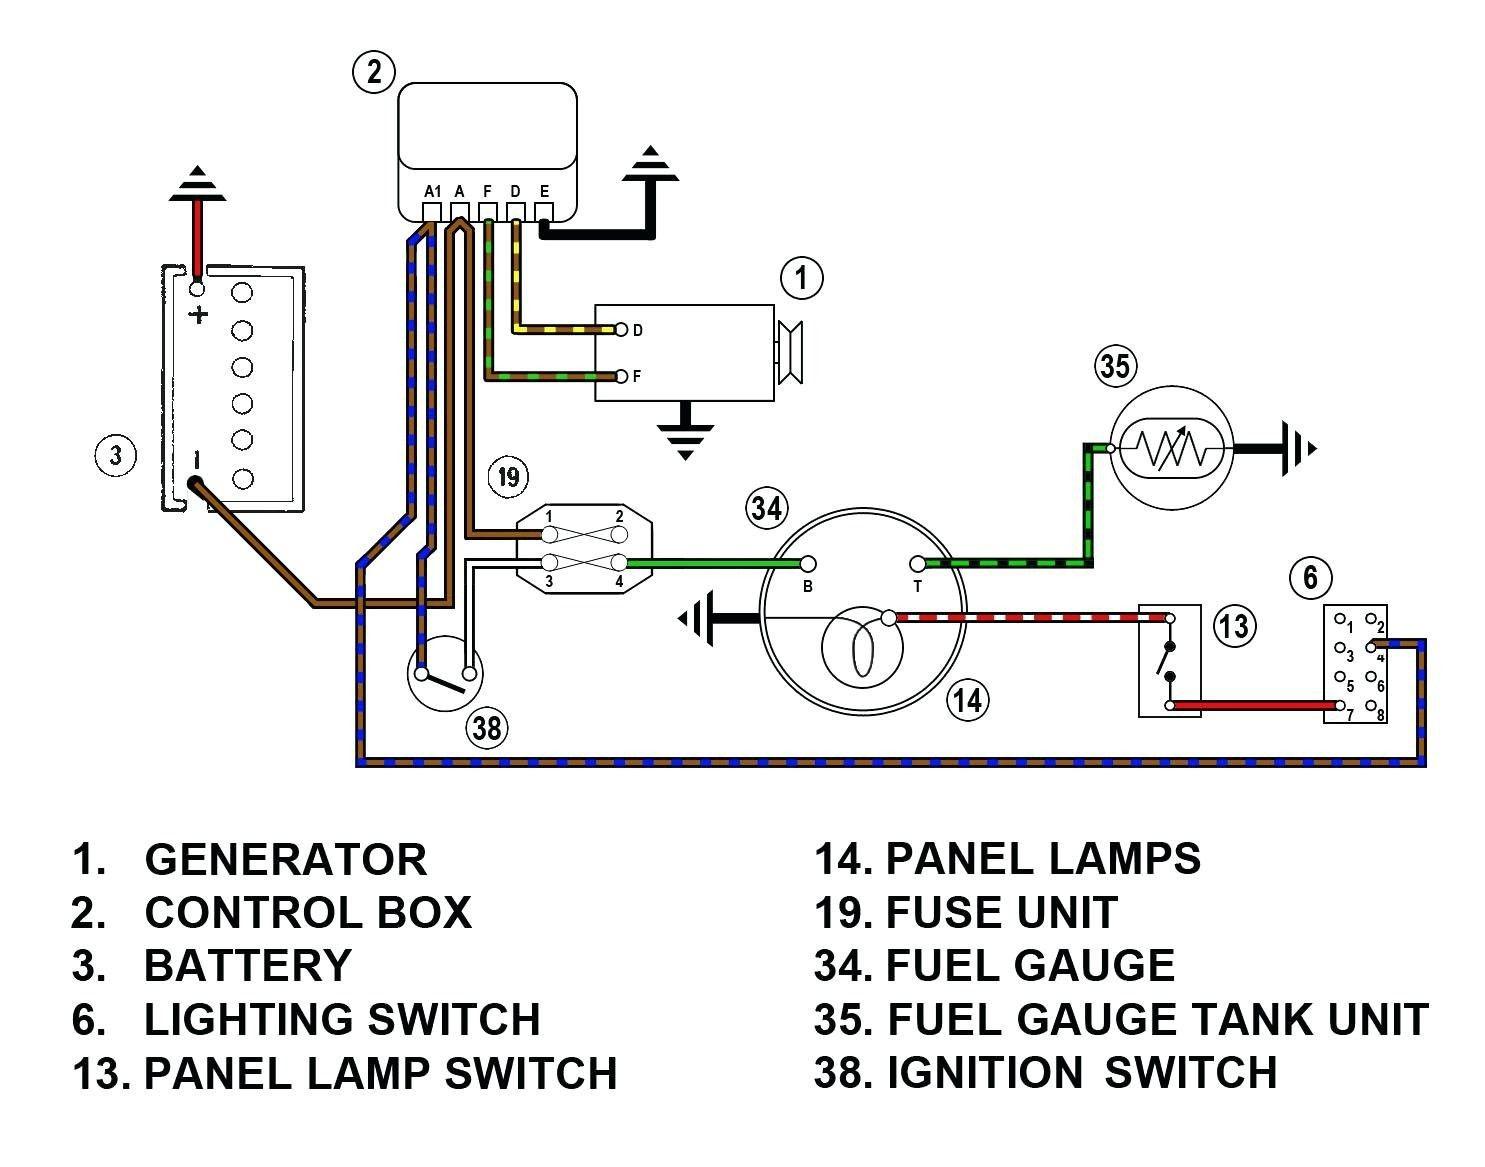 Battery Circuit Diagram Elegant 2 Battery Boat Wiring Diagram In 2020 Trailer Wiring Diagram Electrical Panel Wiring Gauges